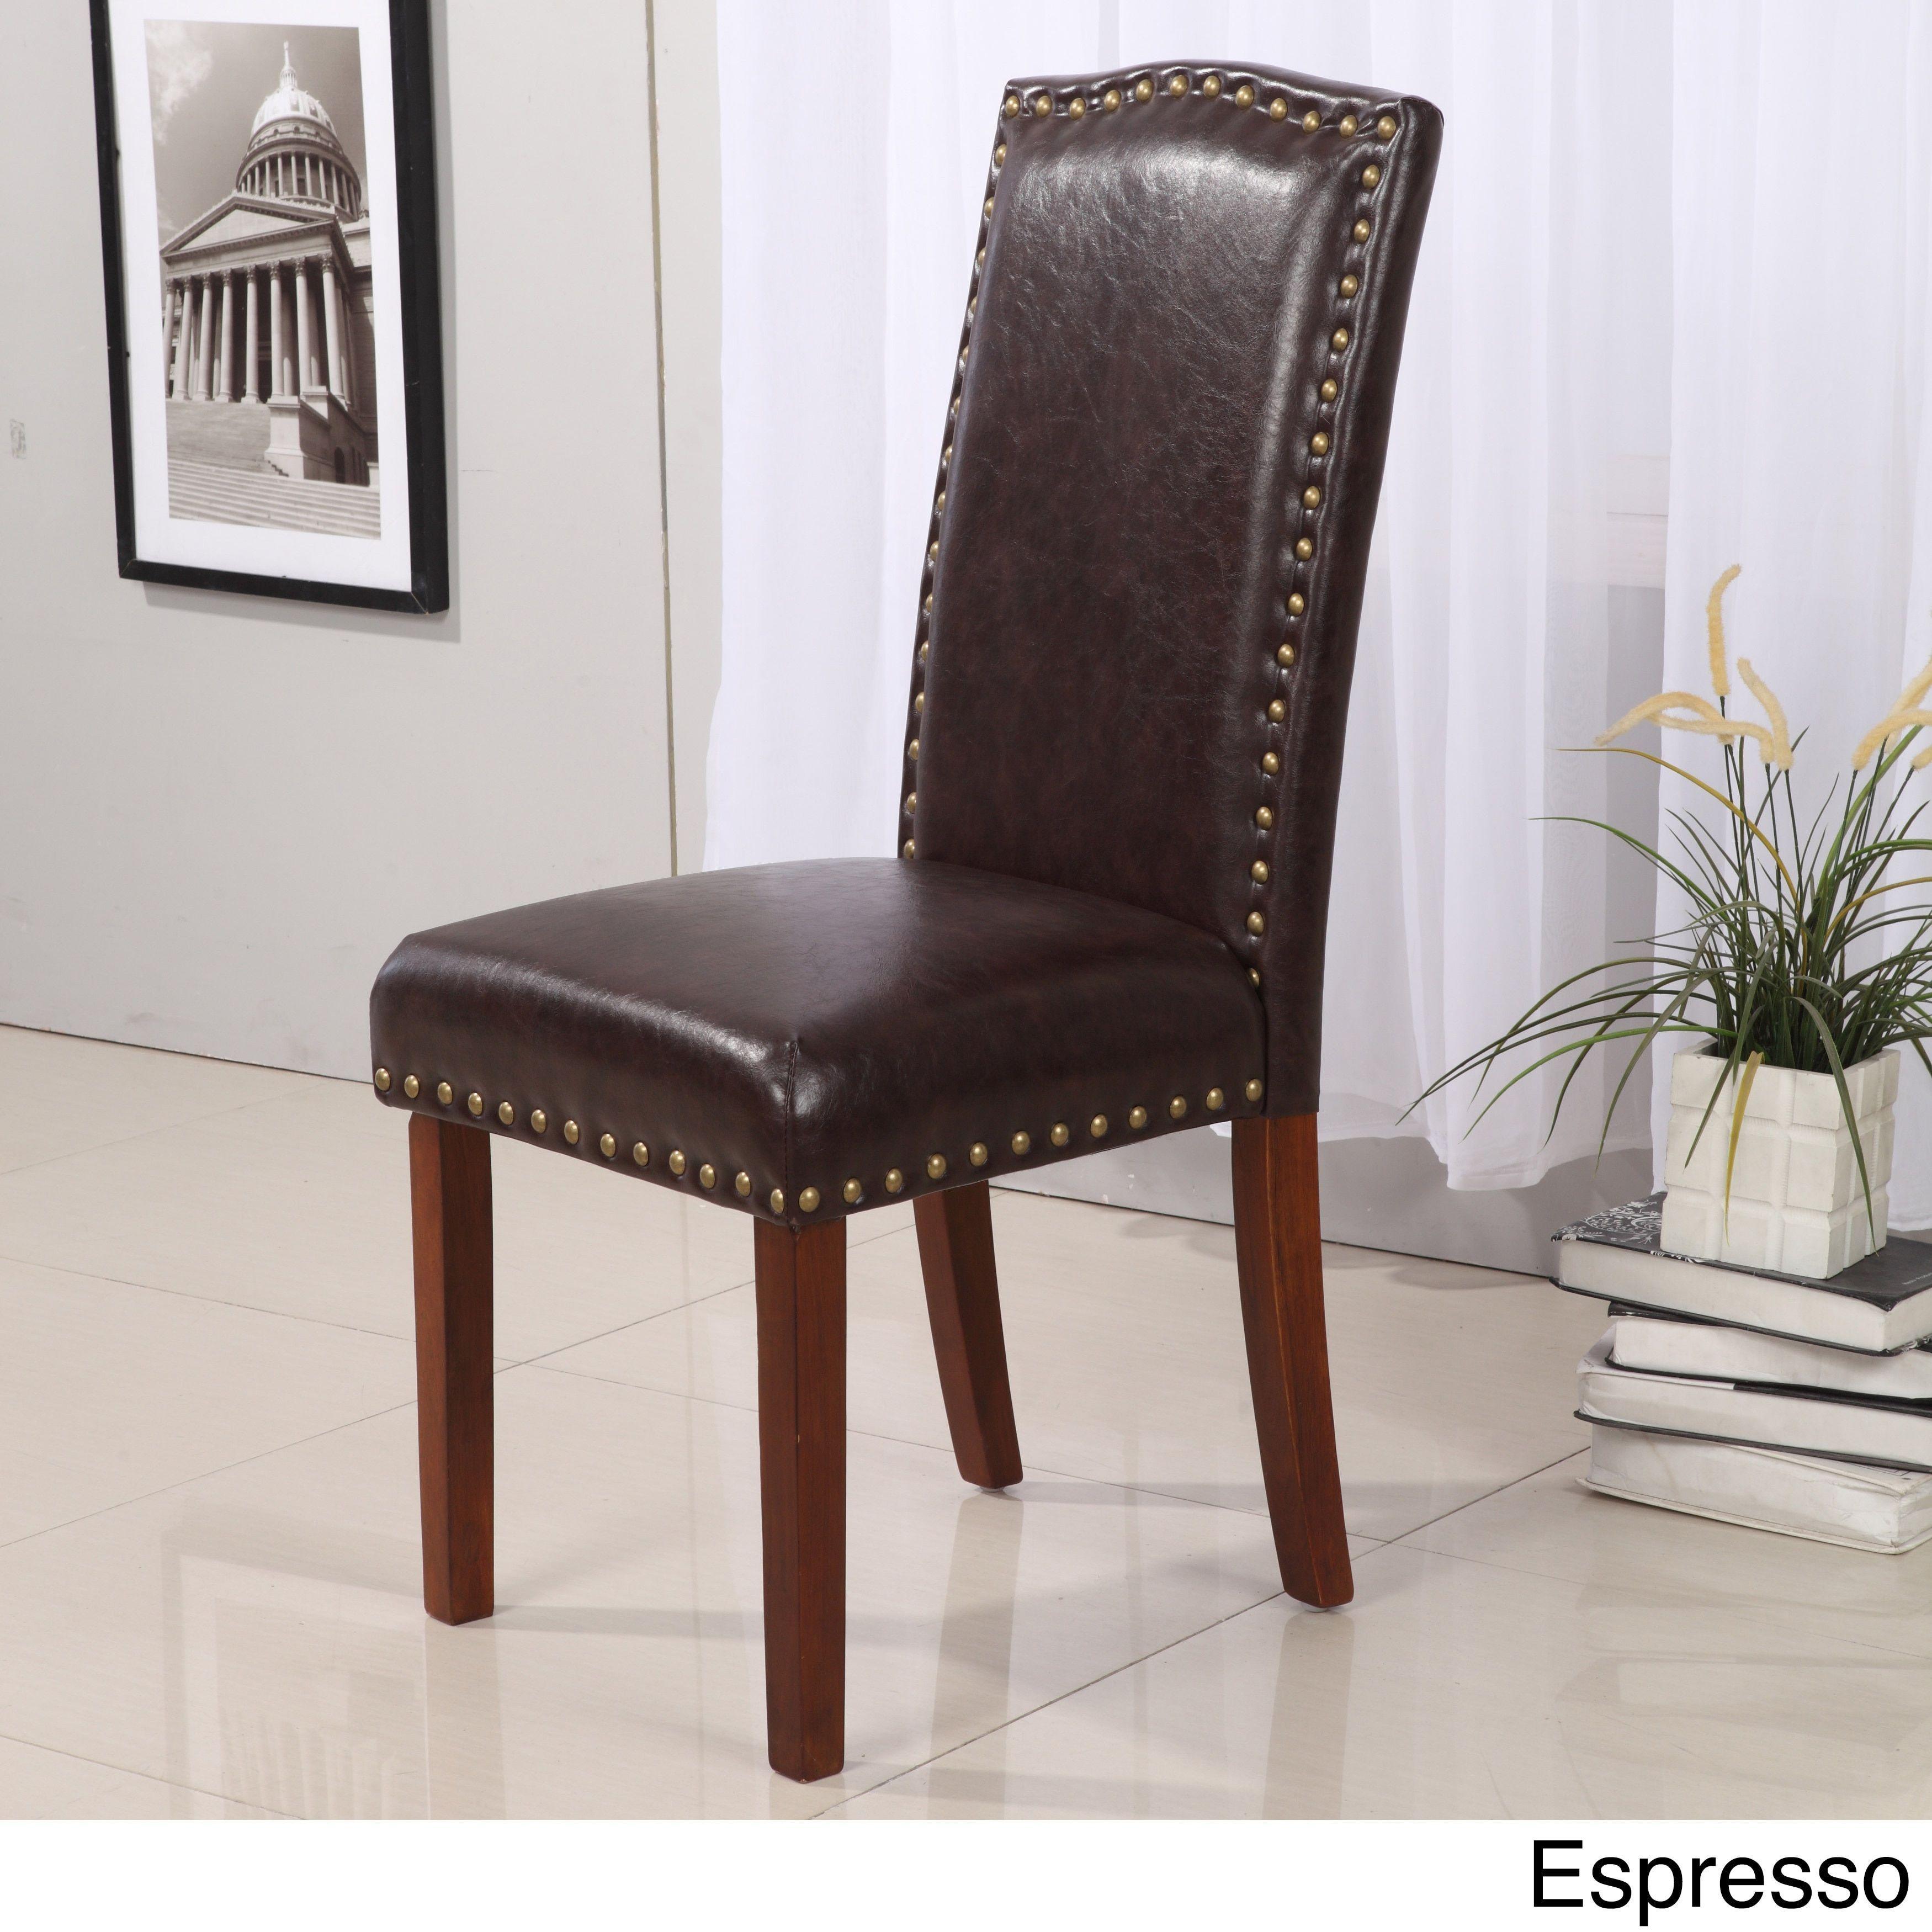 Pleasant Royal Comfort Collection Classic Faux Leather Nailhead Trim Beatyapartments Chair Design Images Beatyapartmentscom